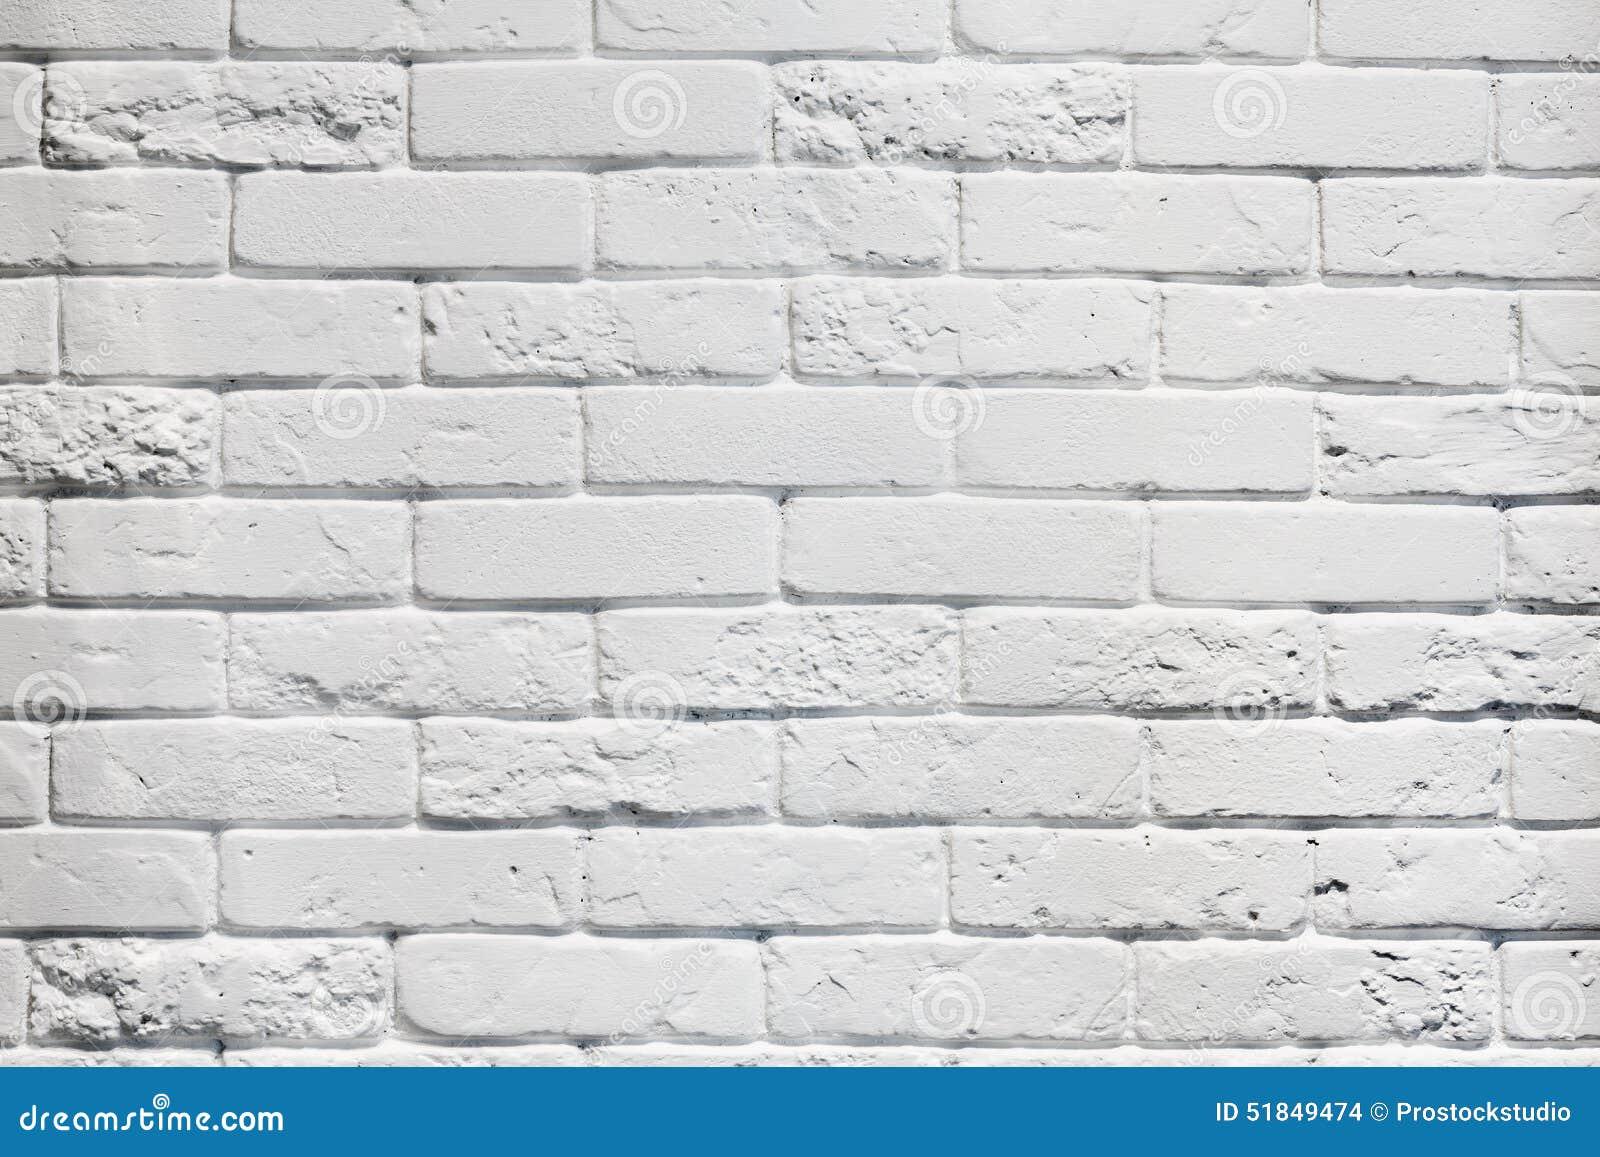 Ladrillo caravista blanco papel pintado ladrillo blanco d - Ladrillo caravista blanco ...